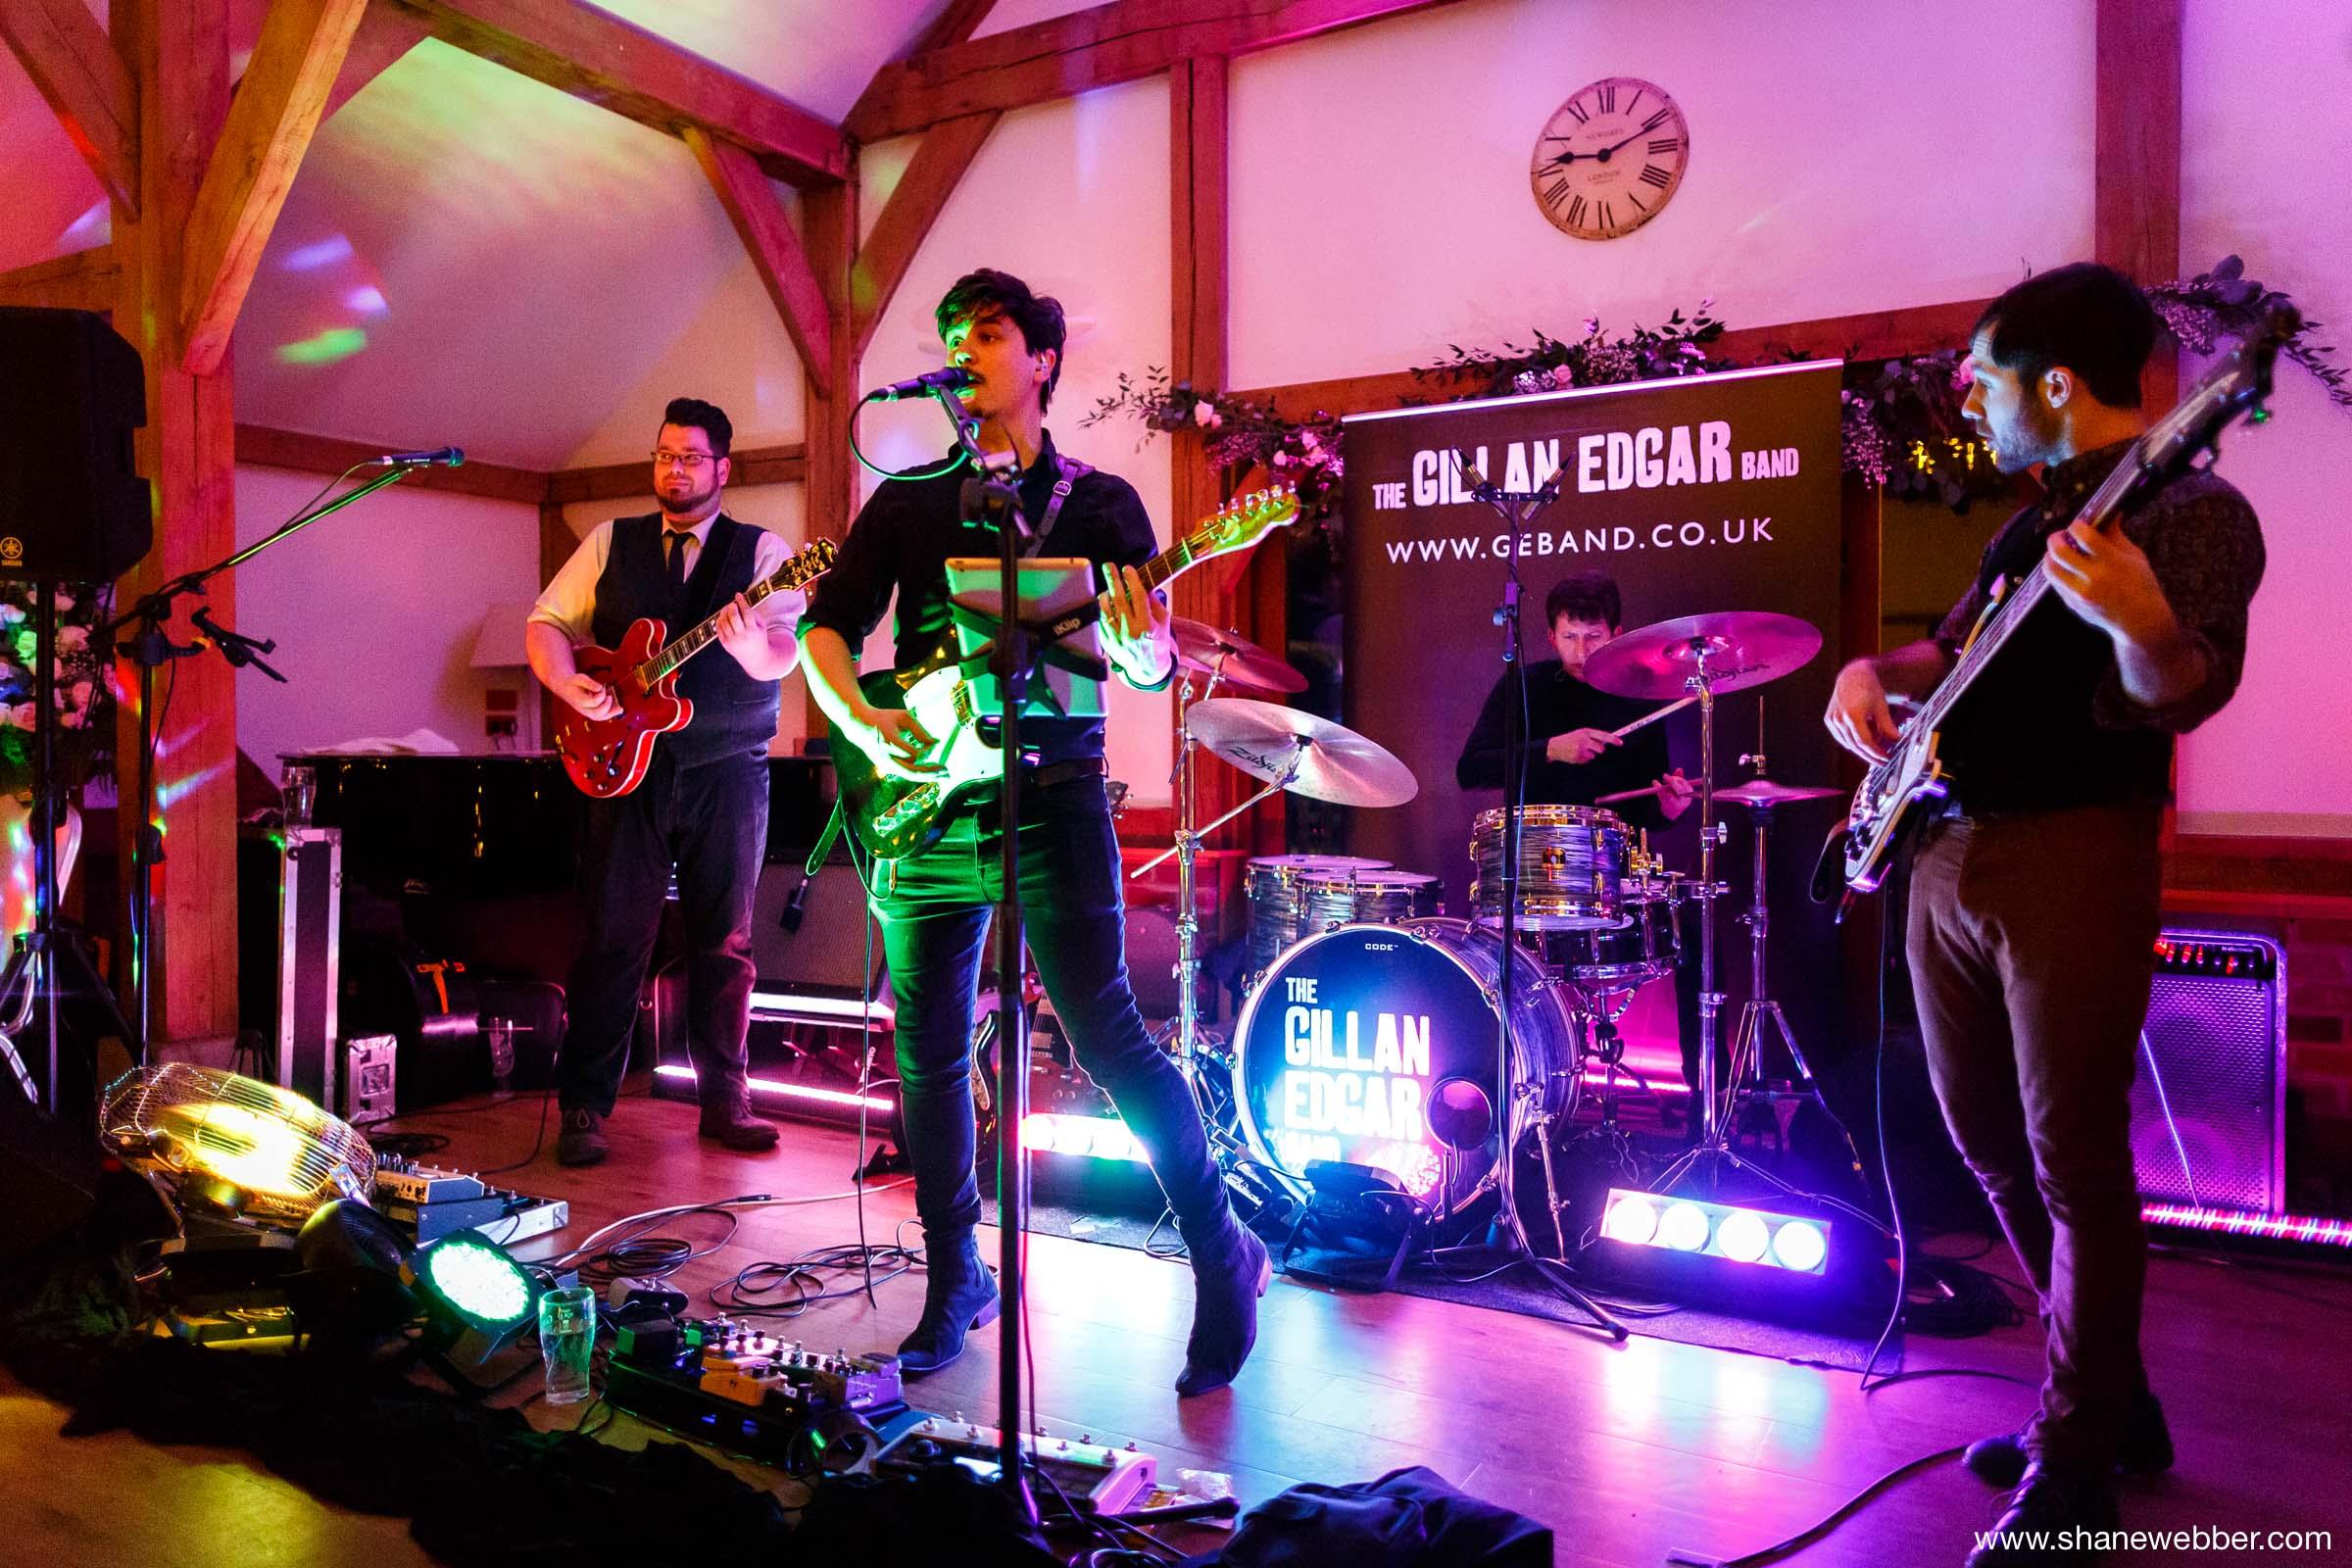 Gillan Edgar Band